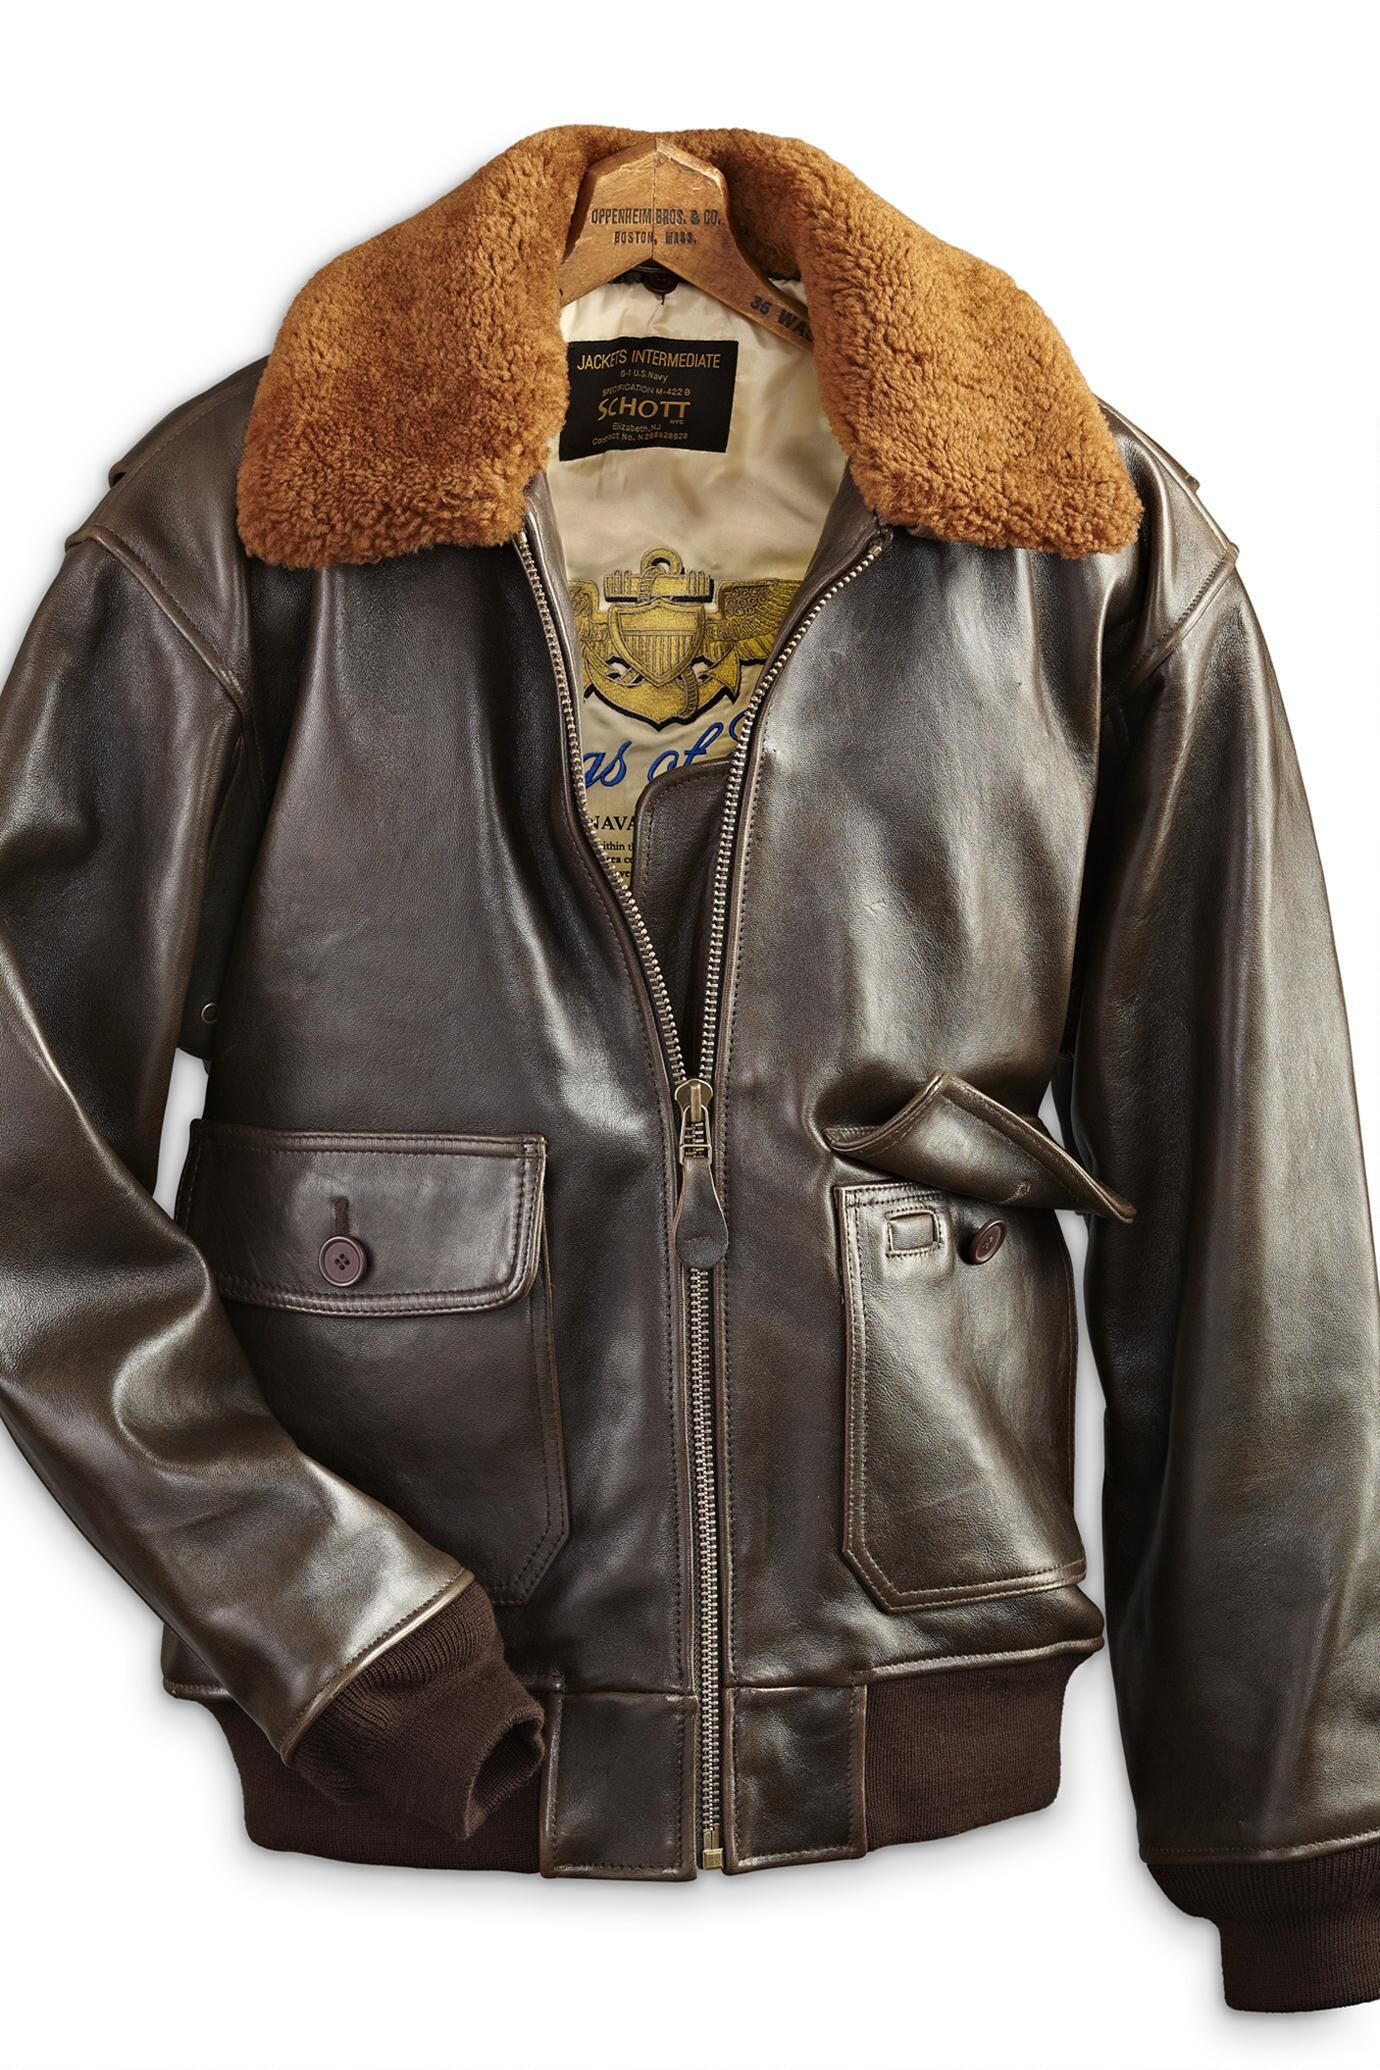 7932dc5c774 Schott G1S Lambskin Jacket with Sheepskin Collar